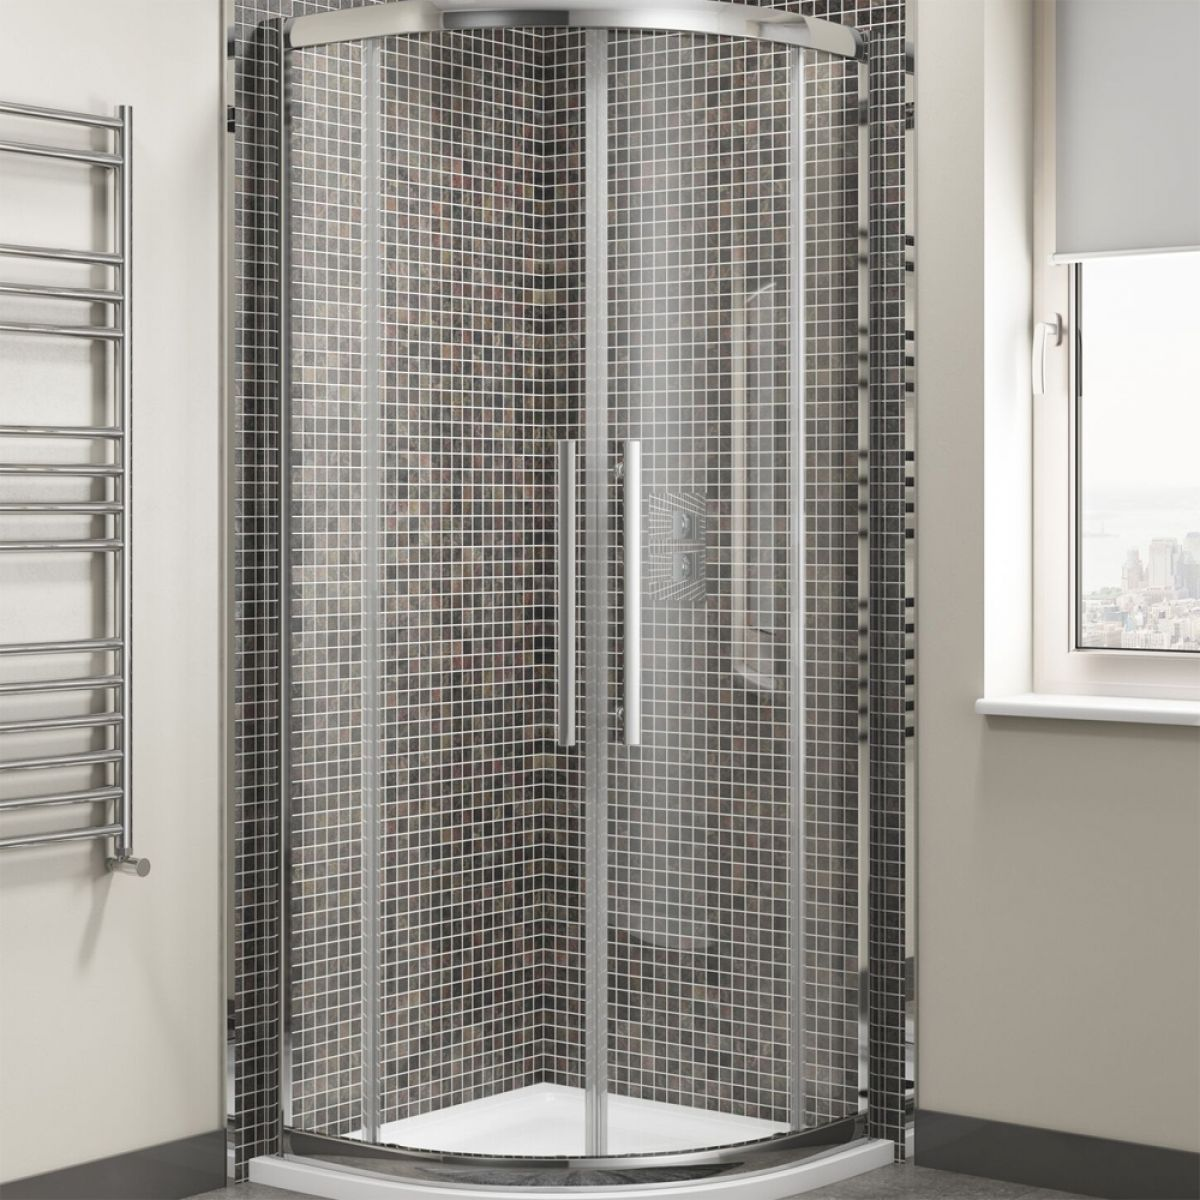 Cassellie Cass Eight Offset Quadrant Shower Enclosure